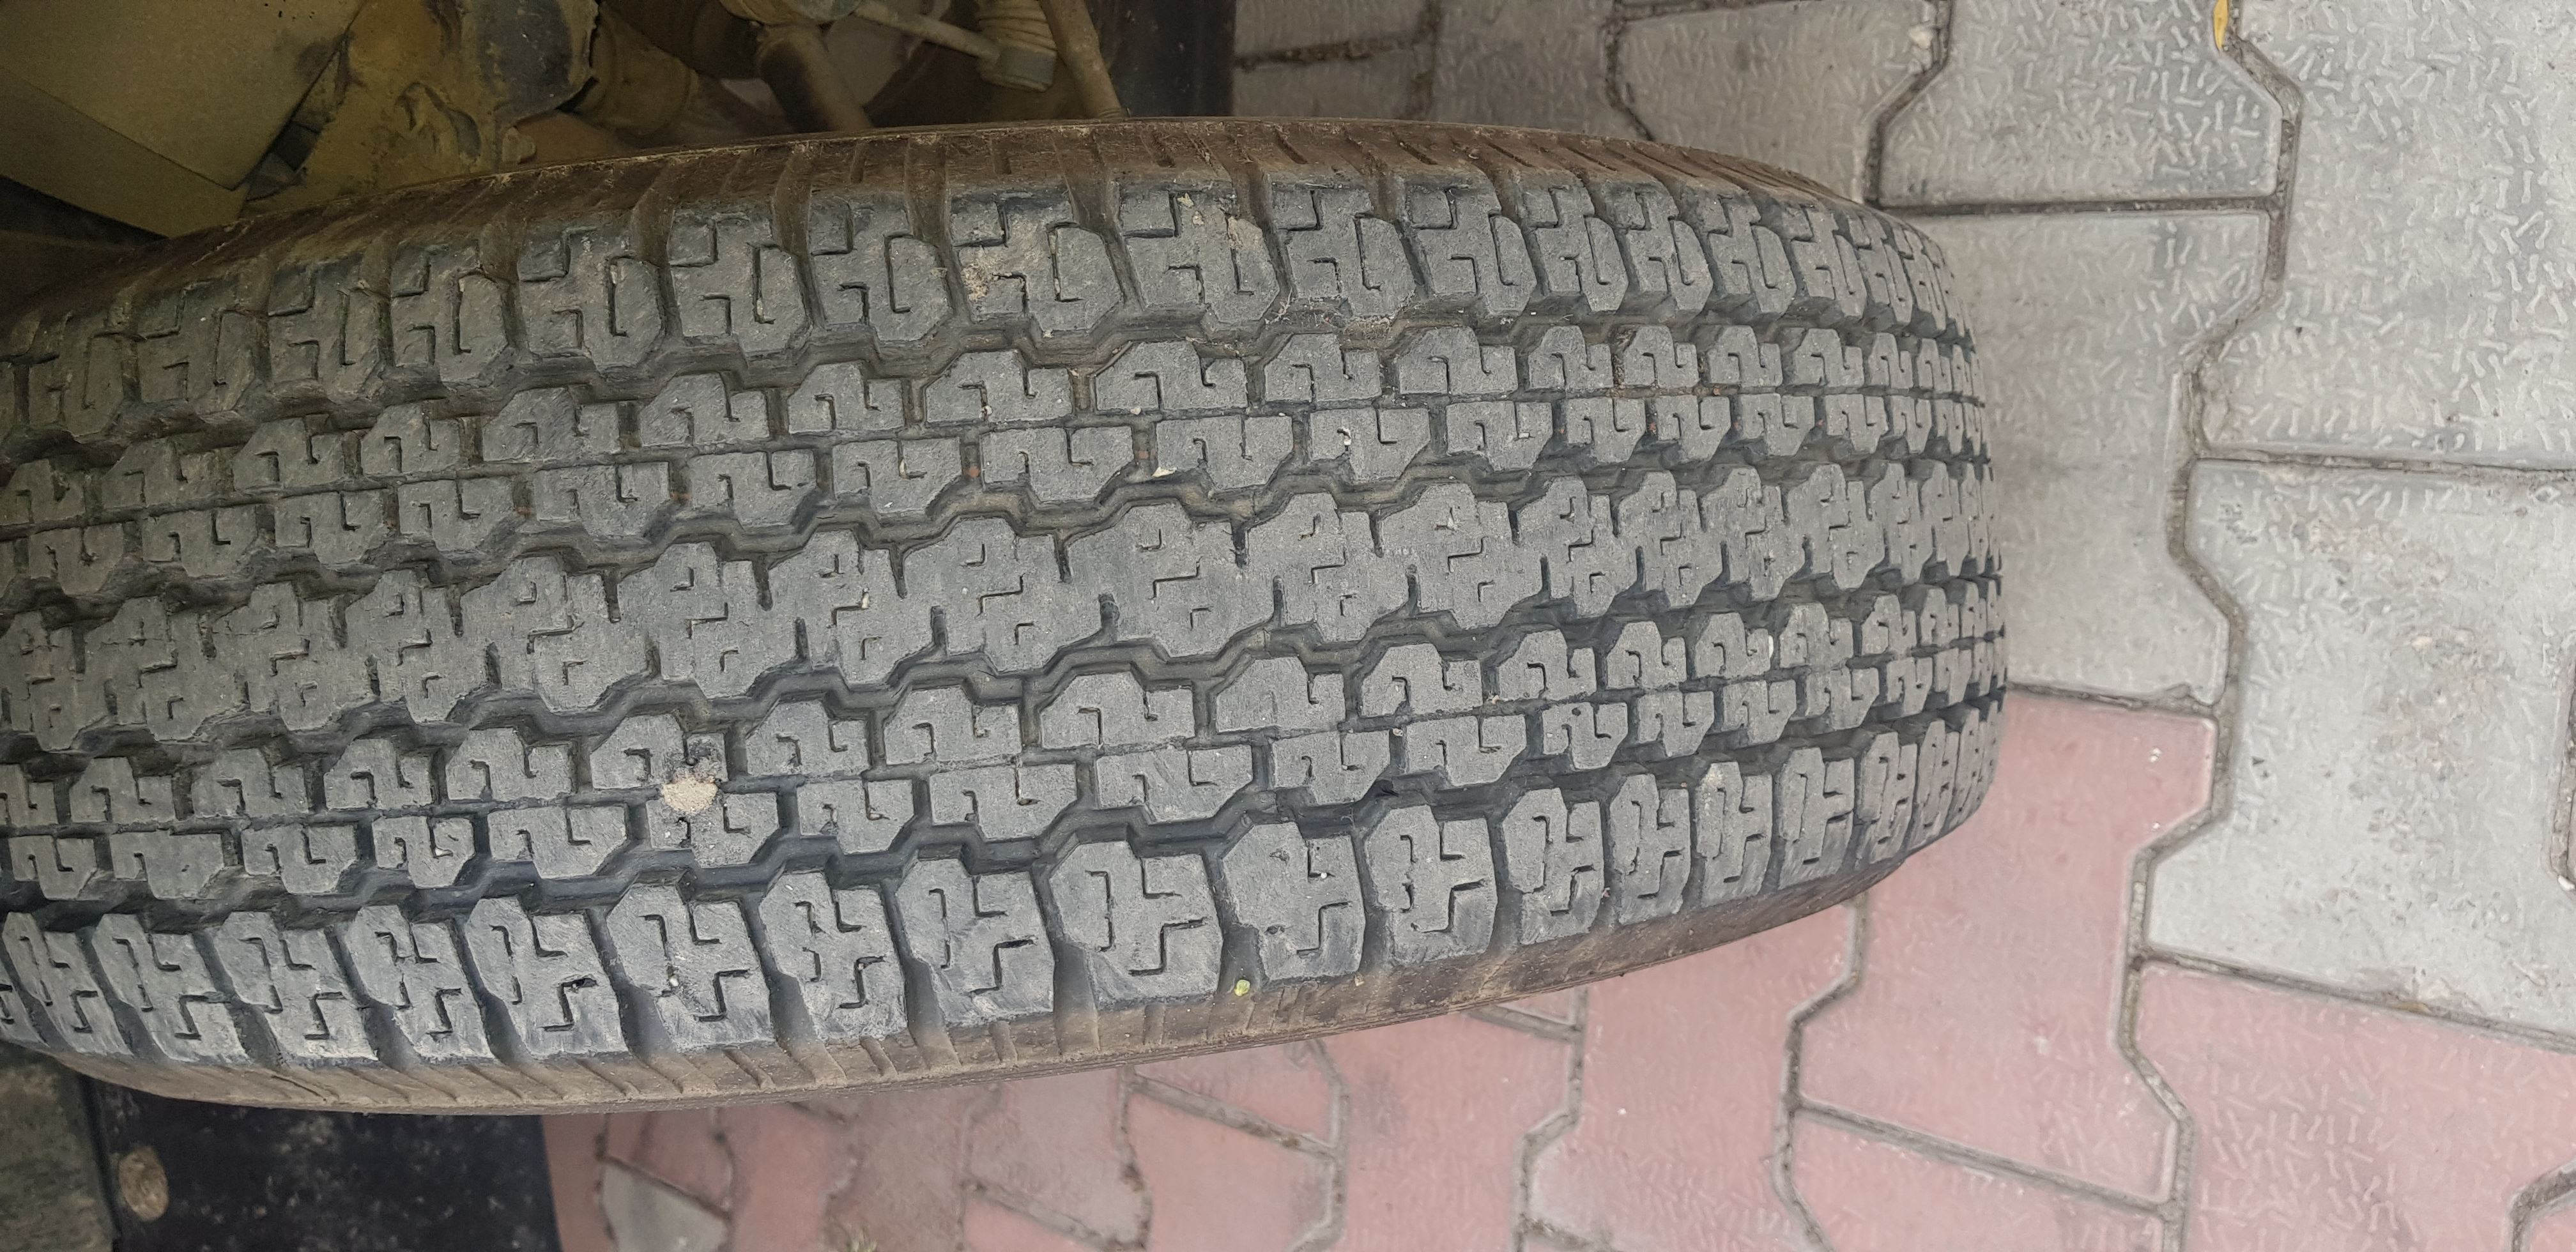 Wheels_tyres 20200602155748